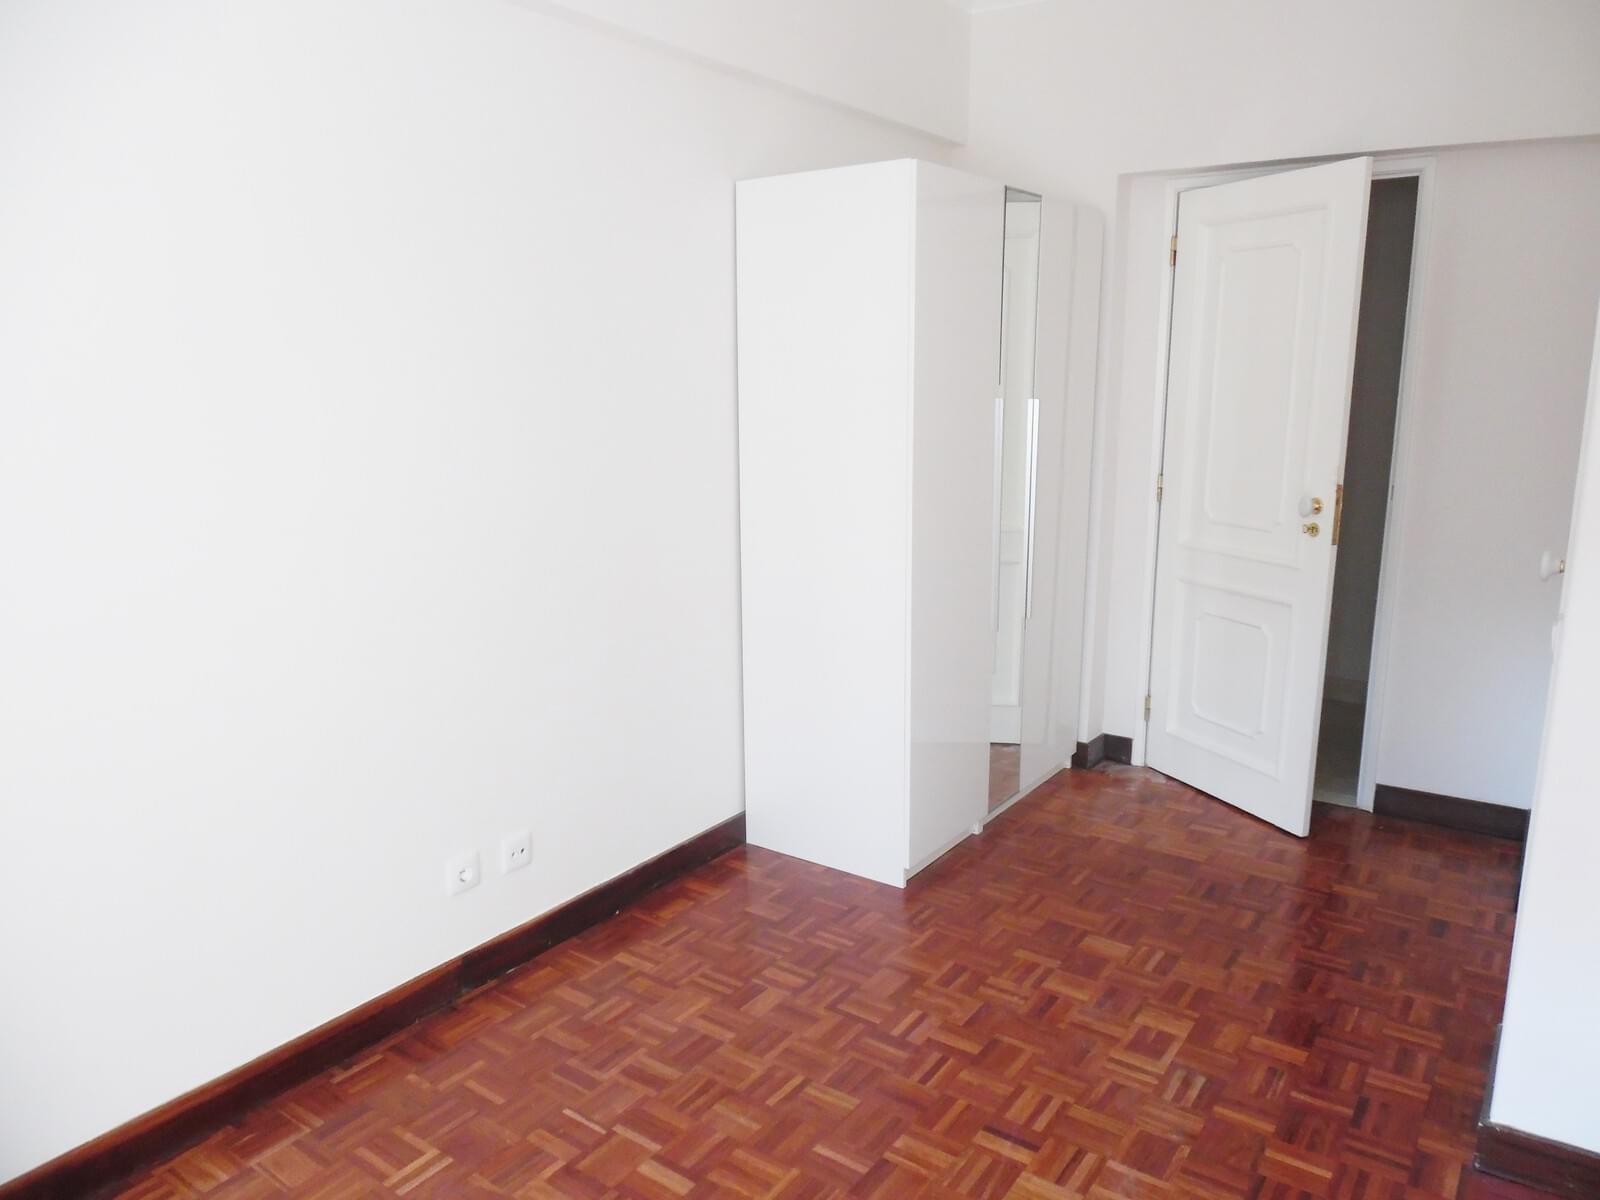 pf17621-apartamento-t4-lisboa-ccff419c-38fc-4540-888f-eb5e79ef8222